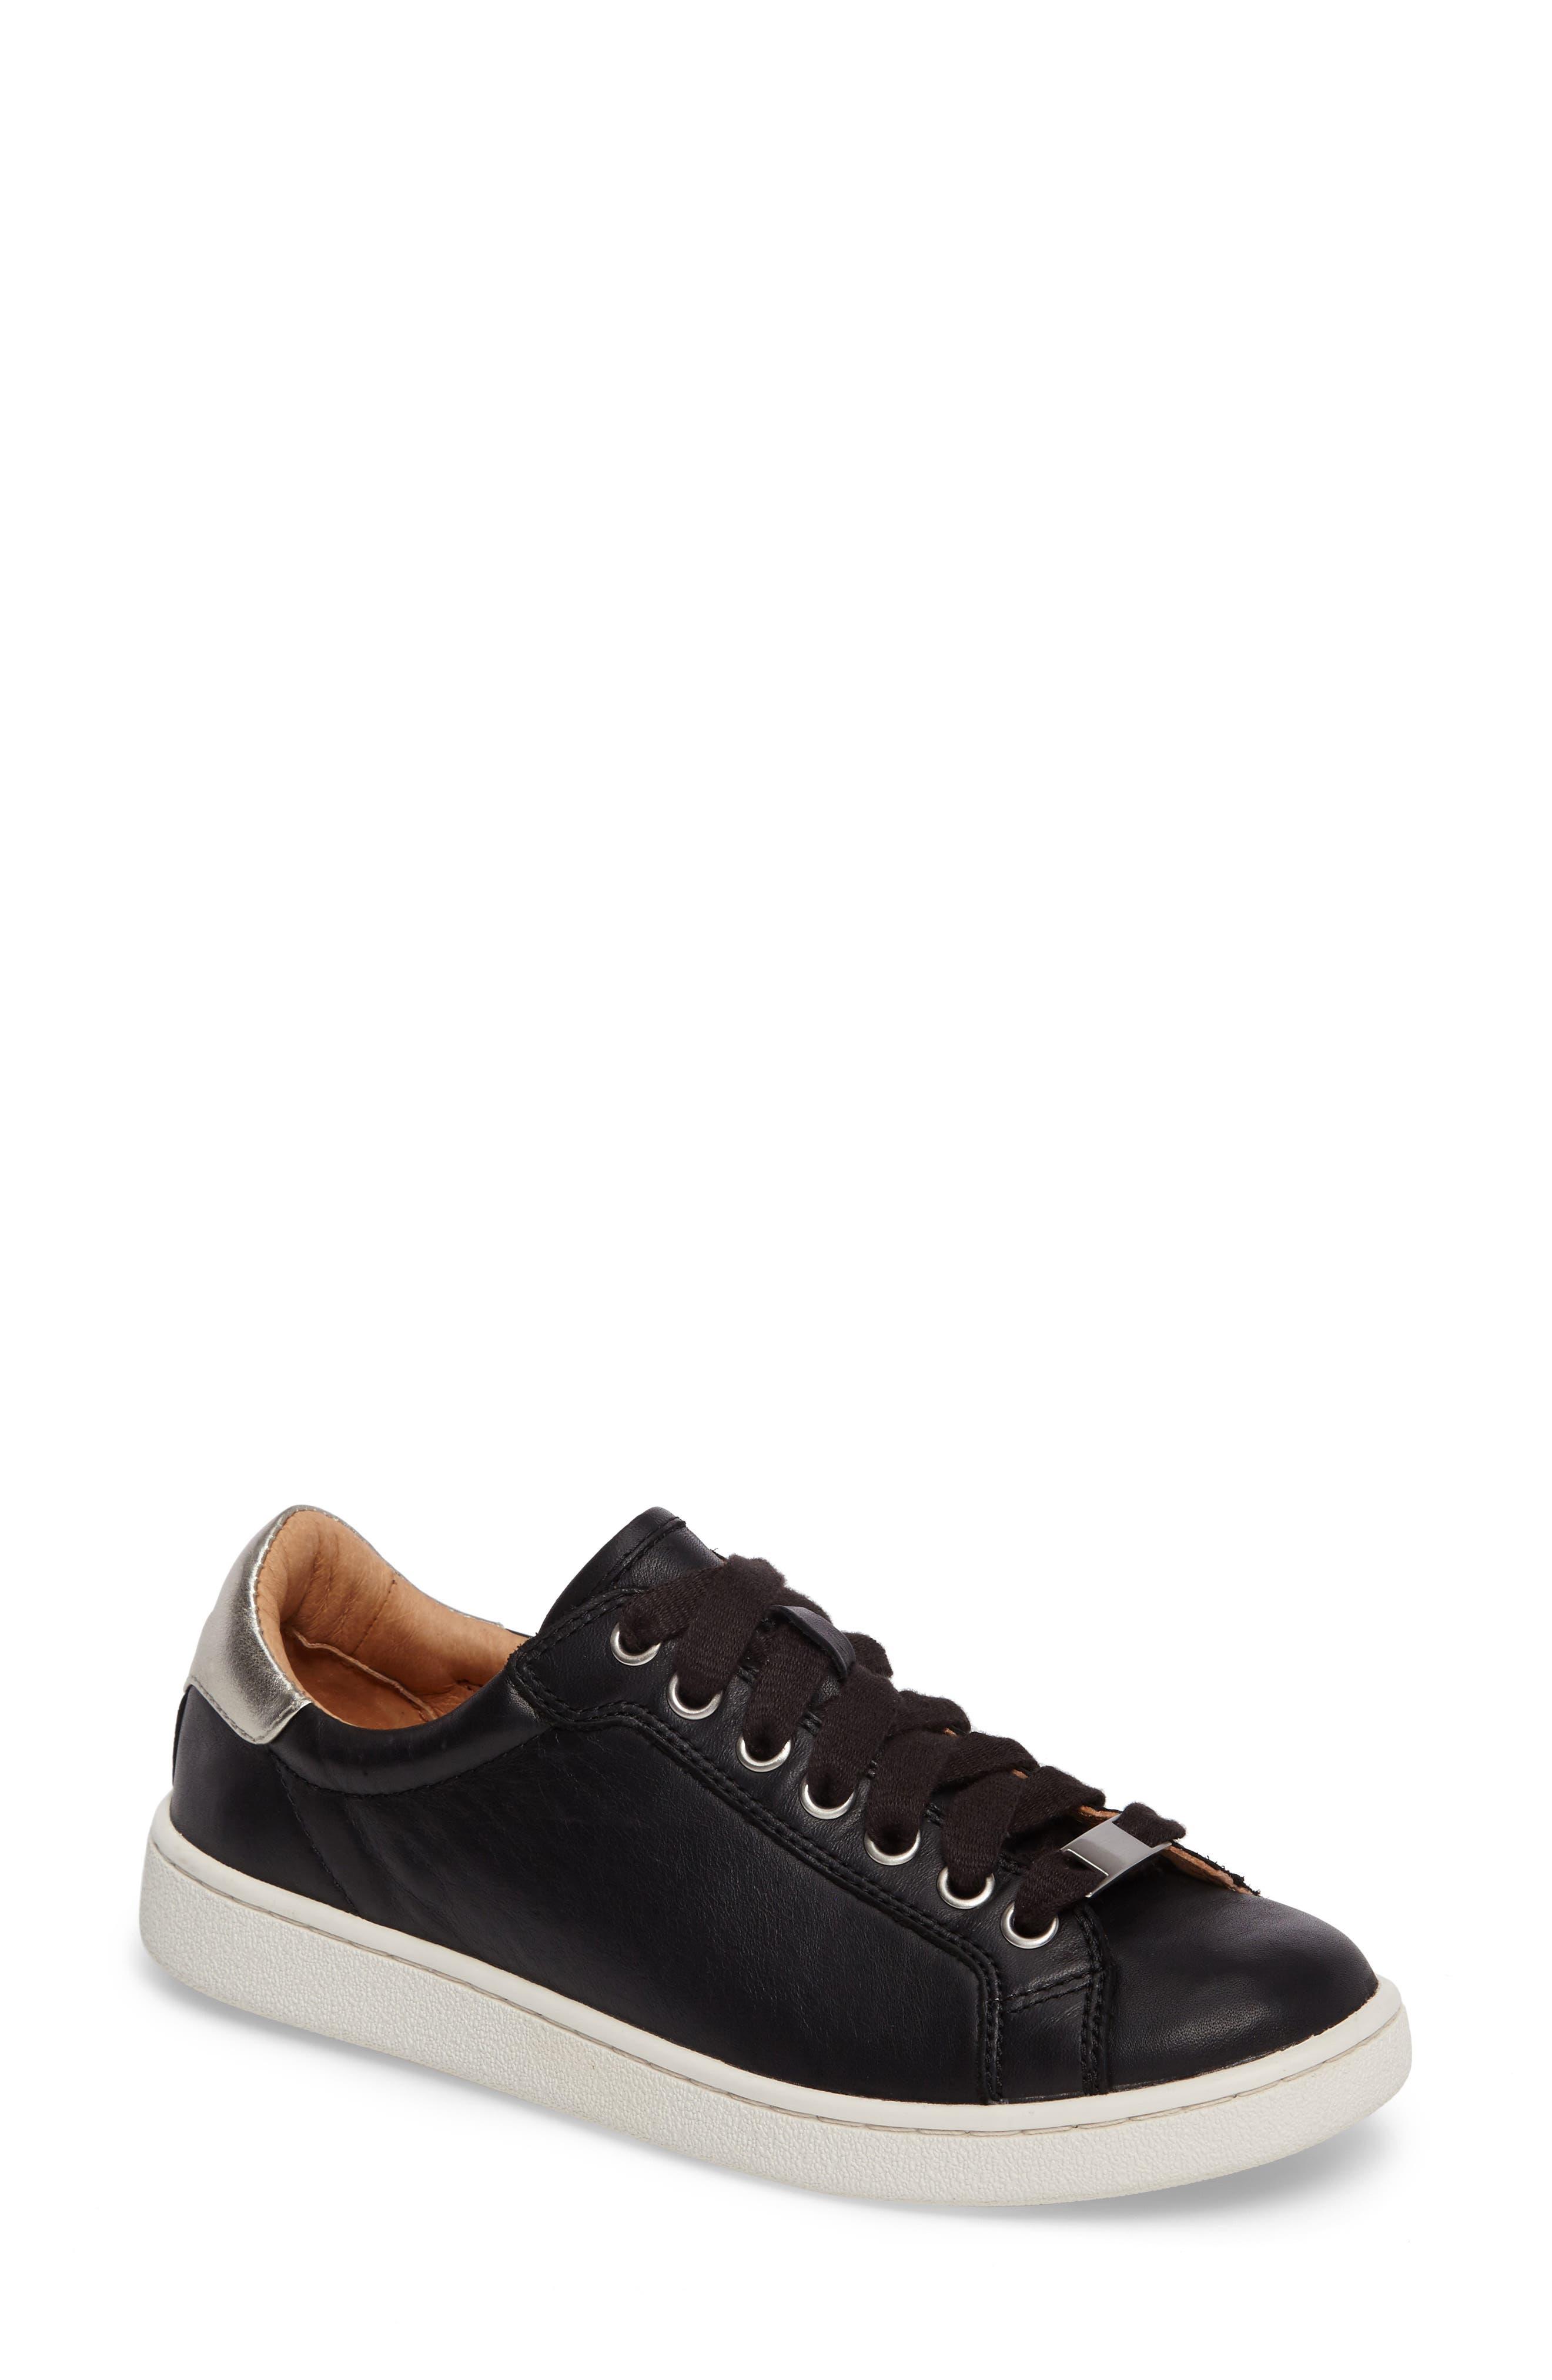 Milo Sneaker,                             Main thumbnail 1, color,                             Black Leather